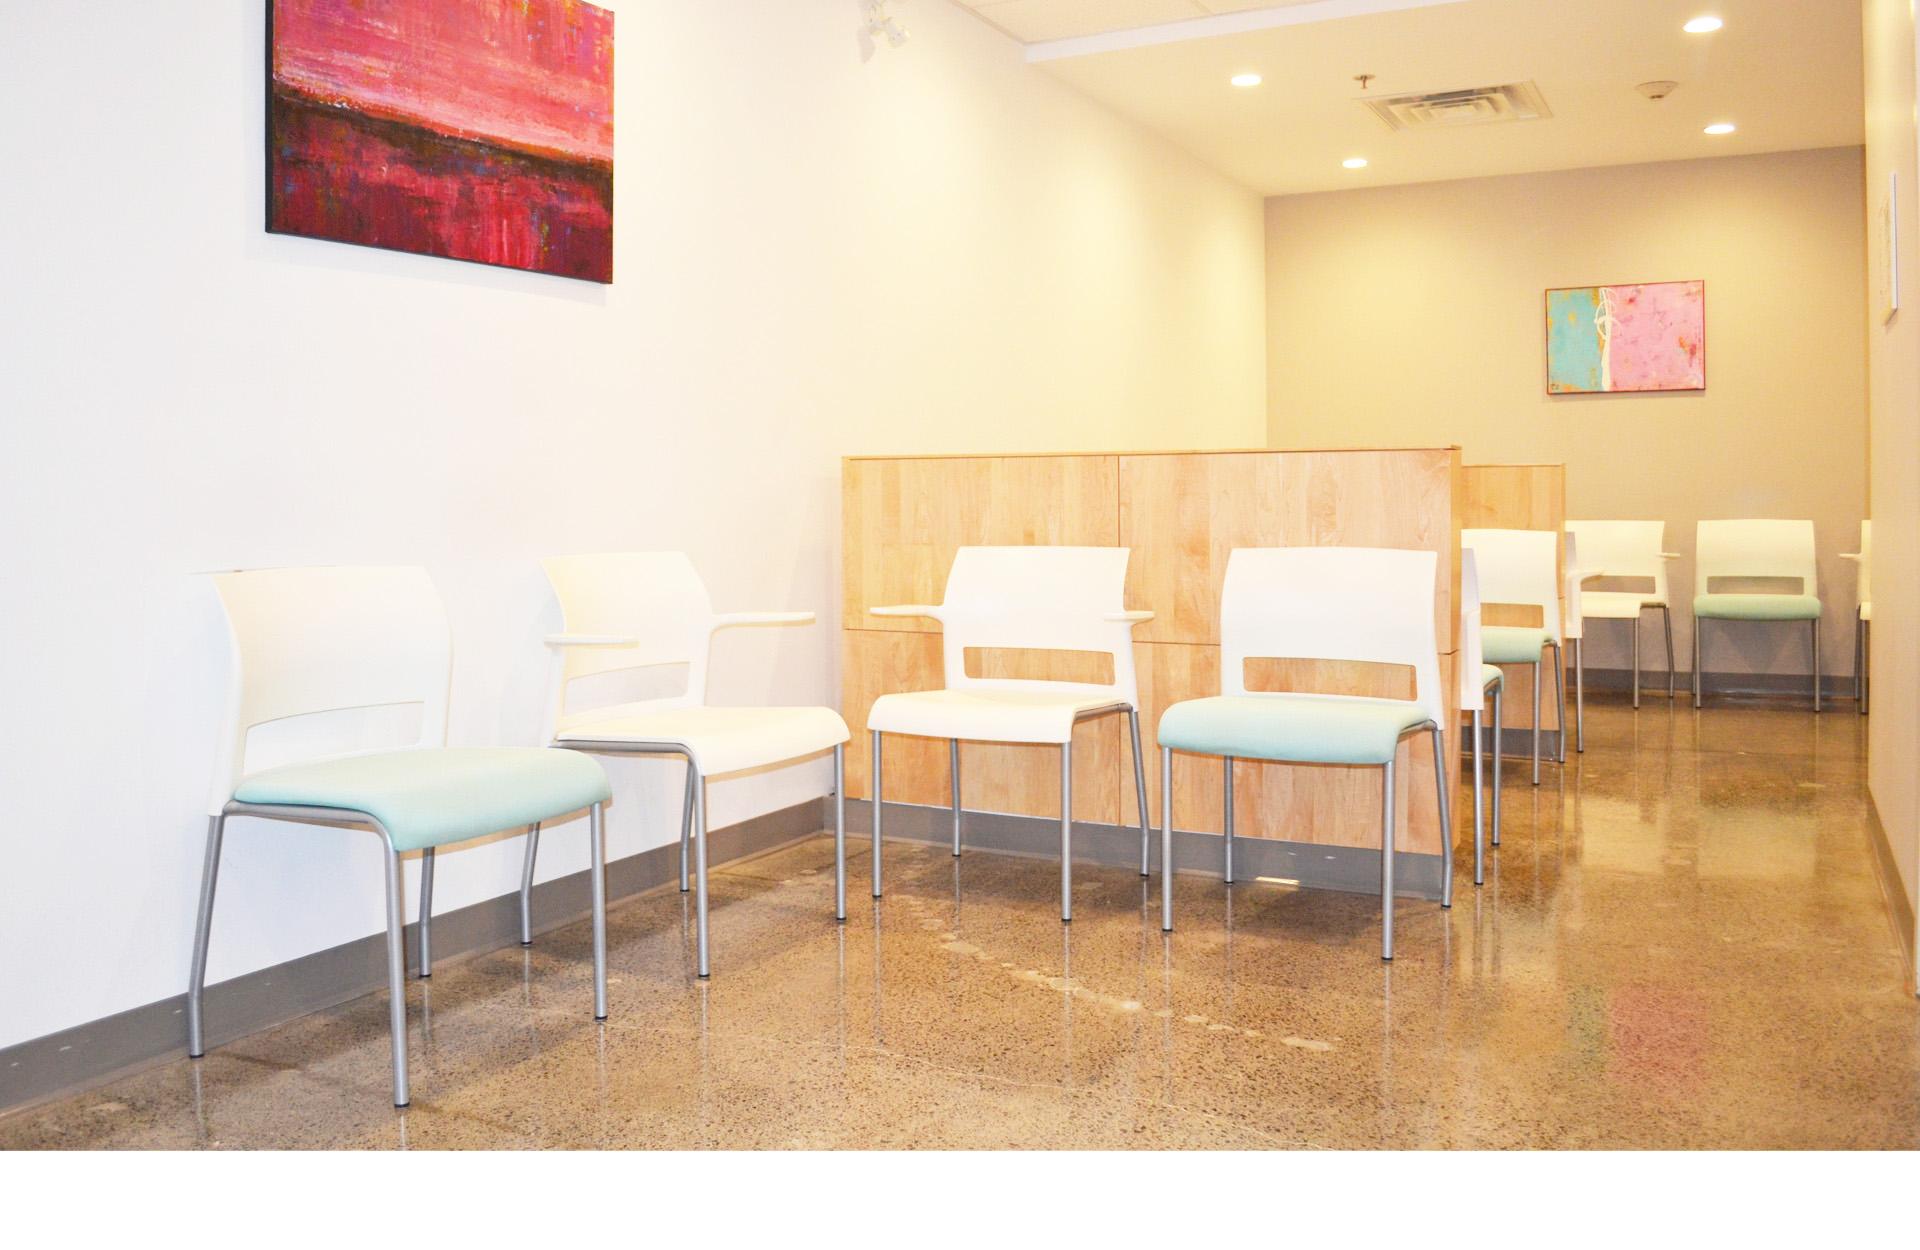 avortement m dicamenteux la clinique morgentaler de montr al. Black Bedroom Furniture Sets. Home Design Ideas